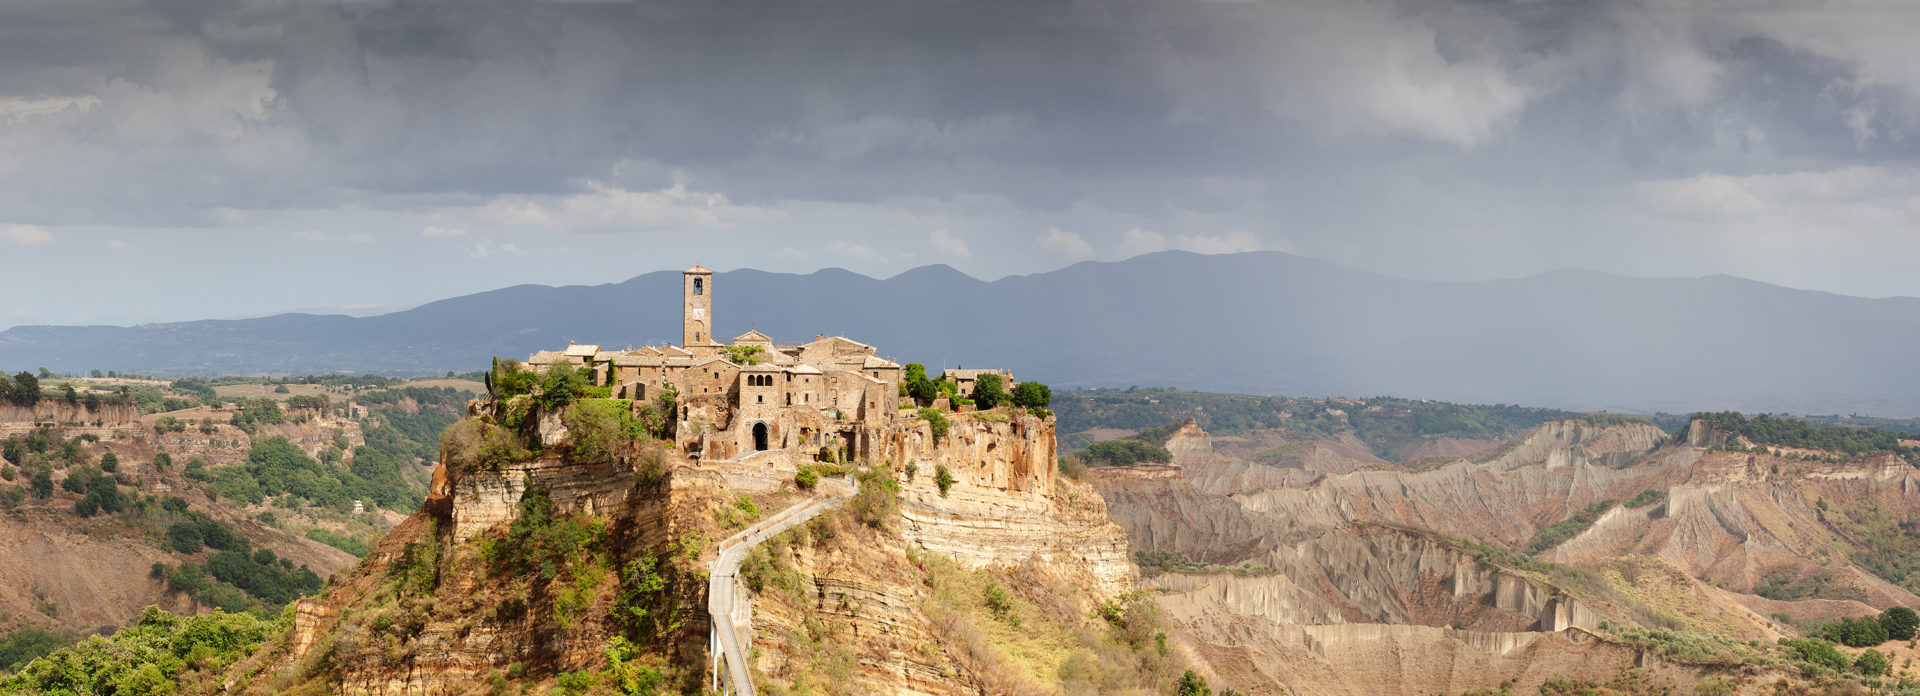 hilltop village in Umbria, Italy